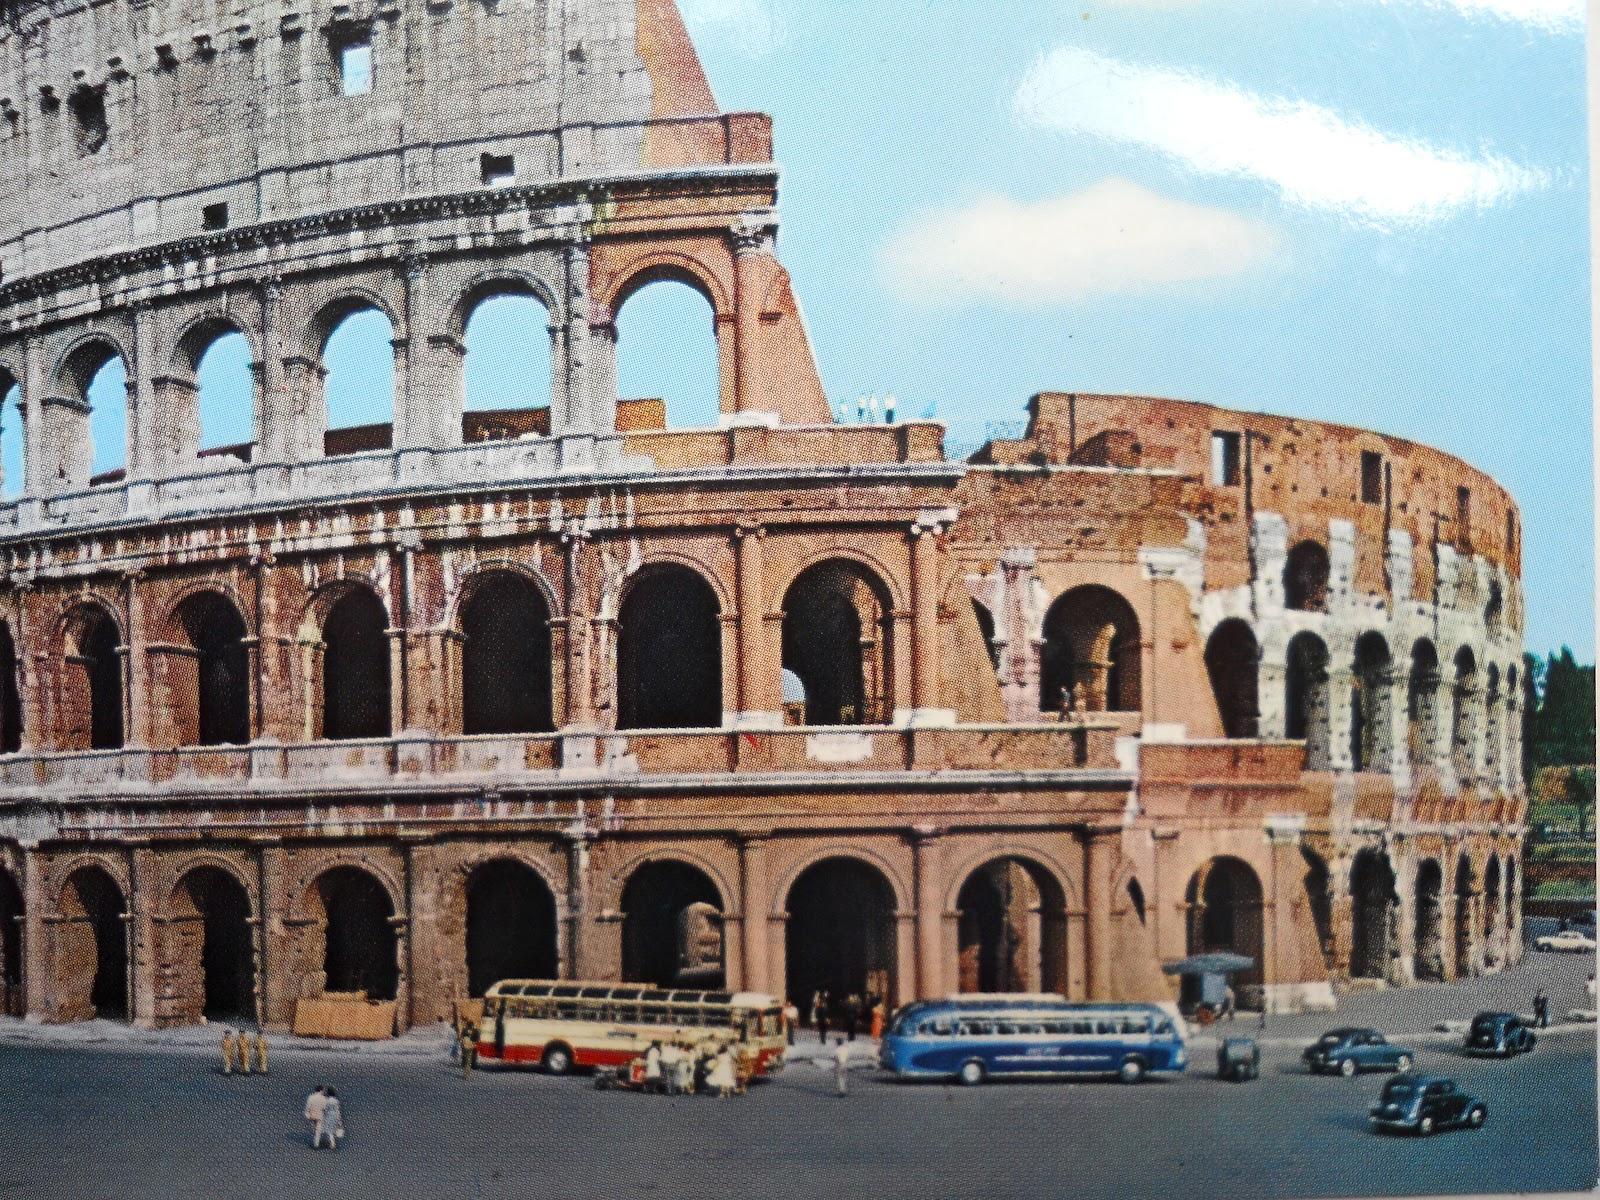 http://2.bp.blogspot.com/-VzLmGuHwBmw/UDXXrFCg2WI/AAAAAAAABfc/xyGMYSK6YuE/s1600/Italy+Rome+001.JPG